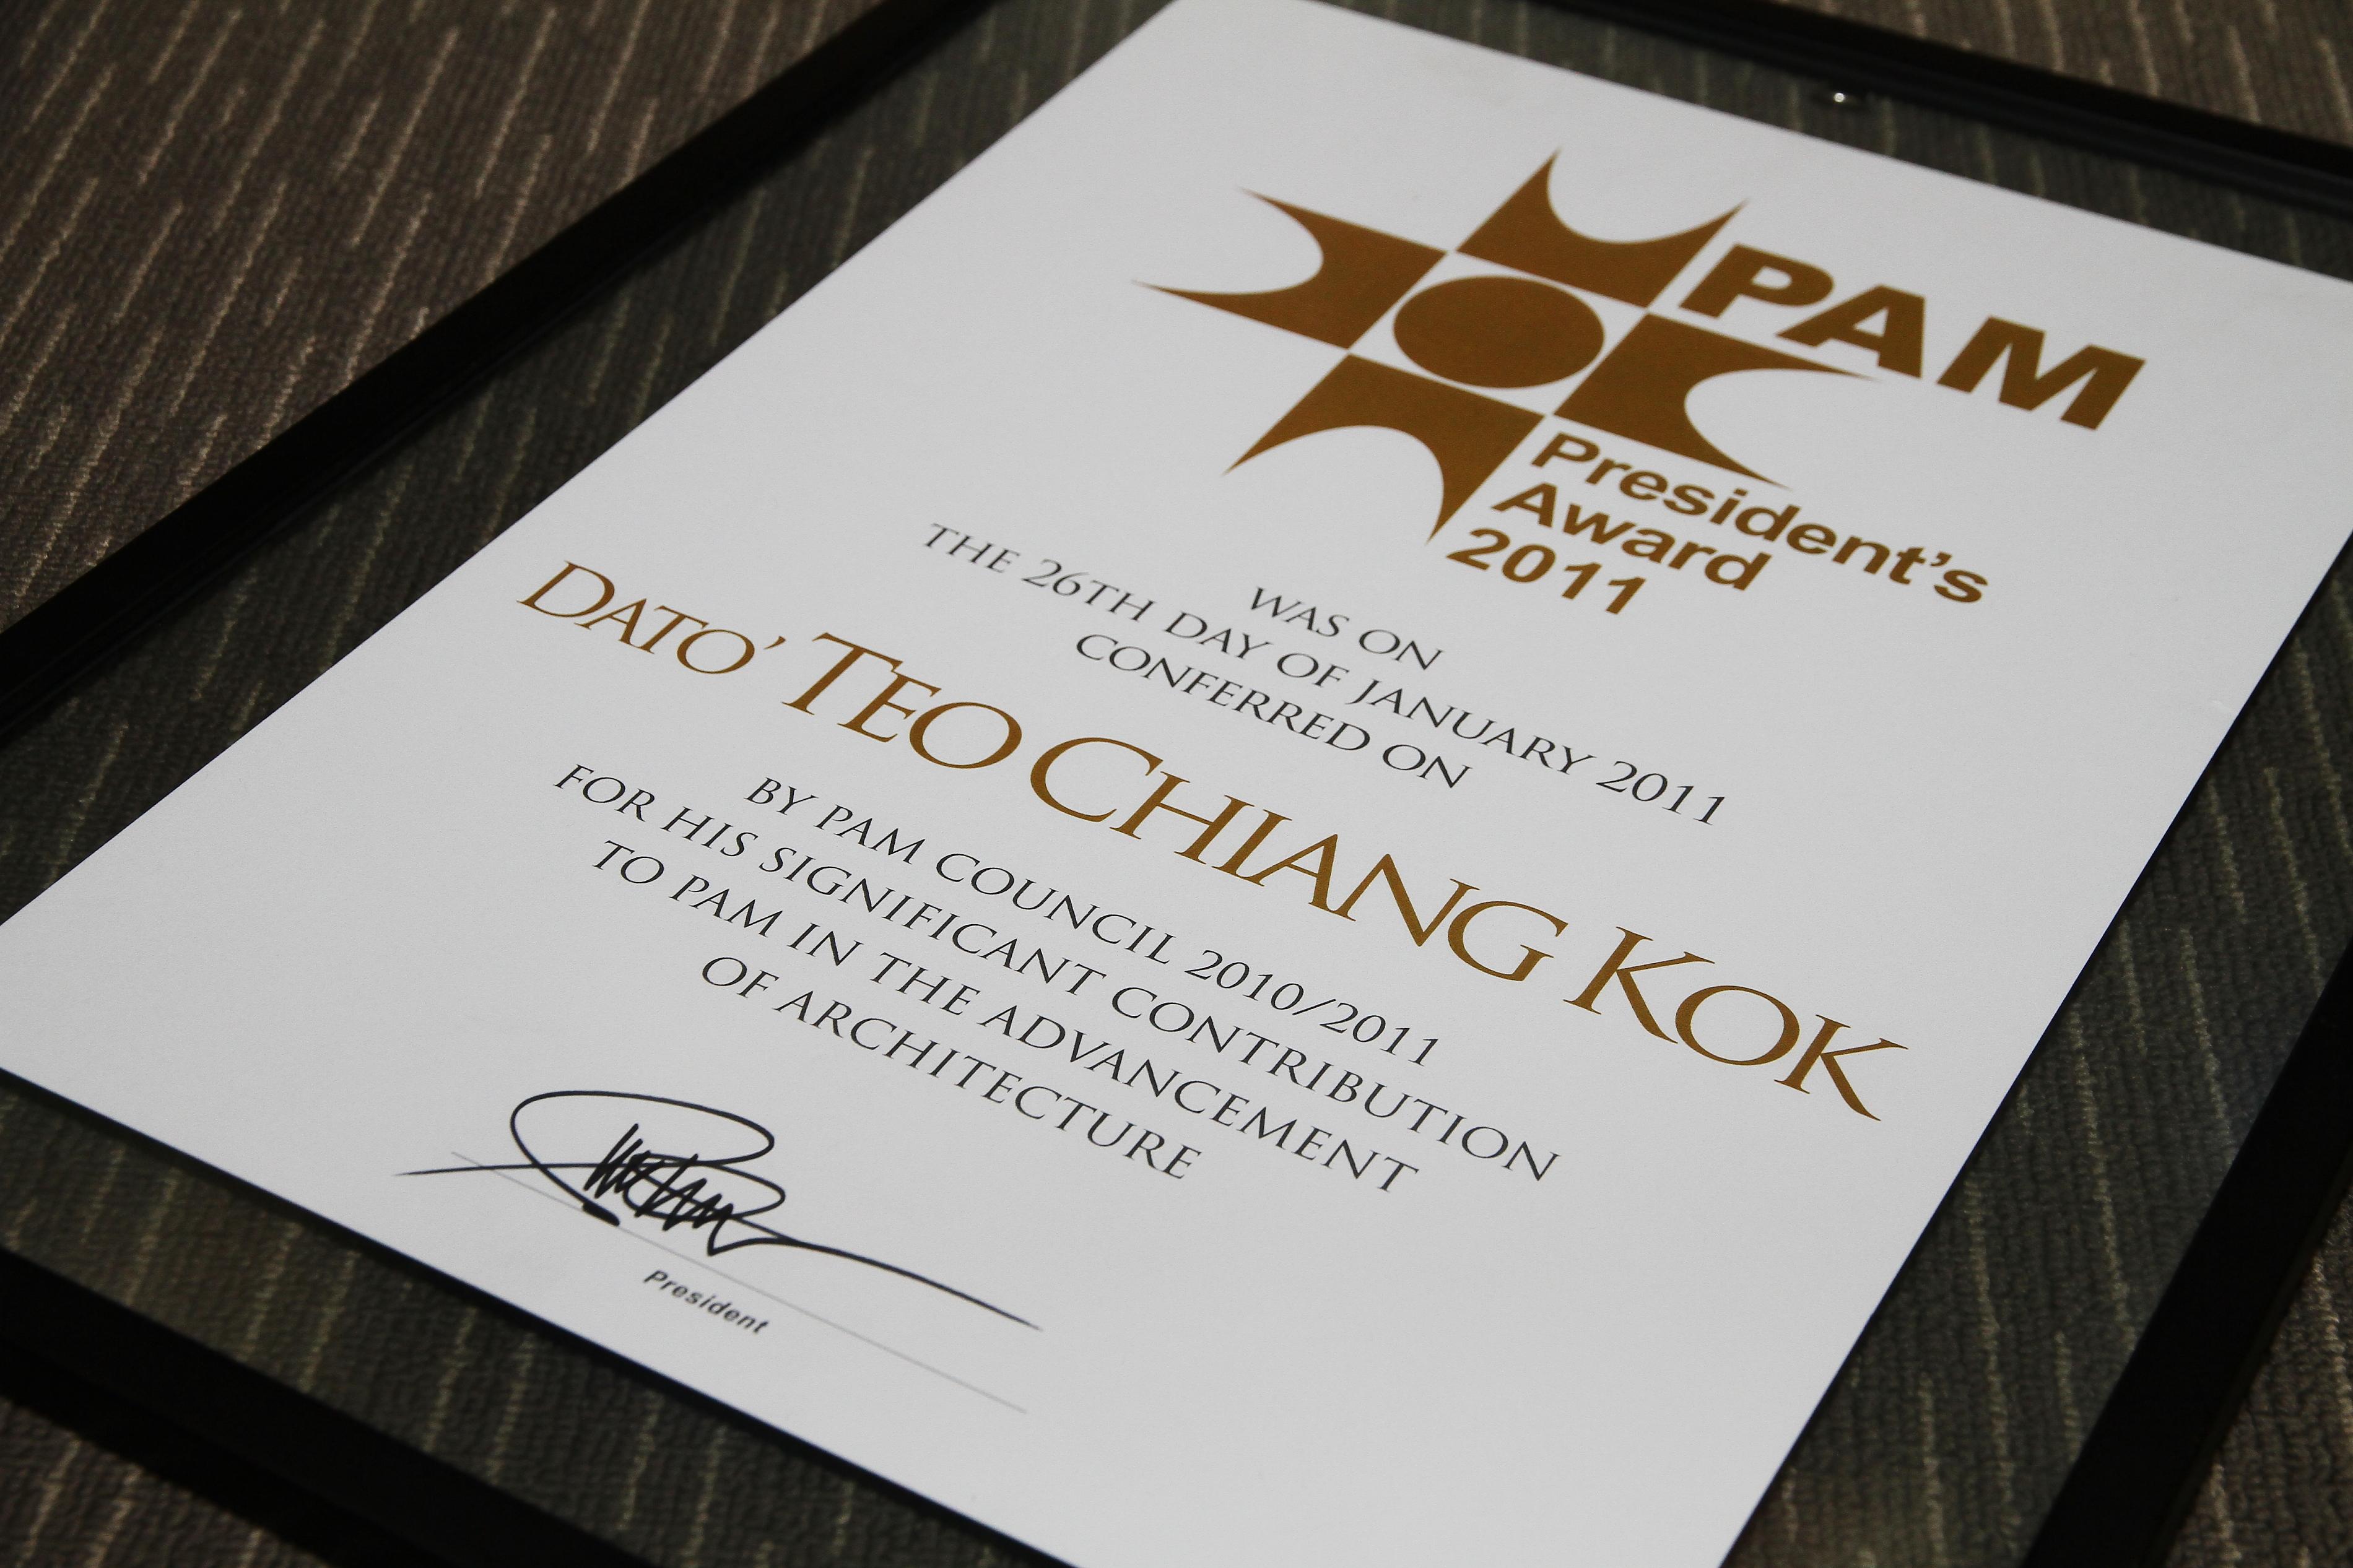 PAM President award certificate